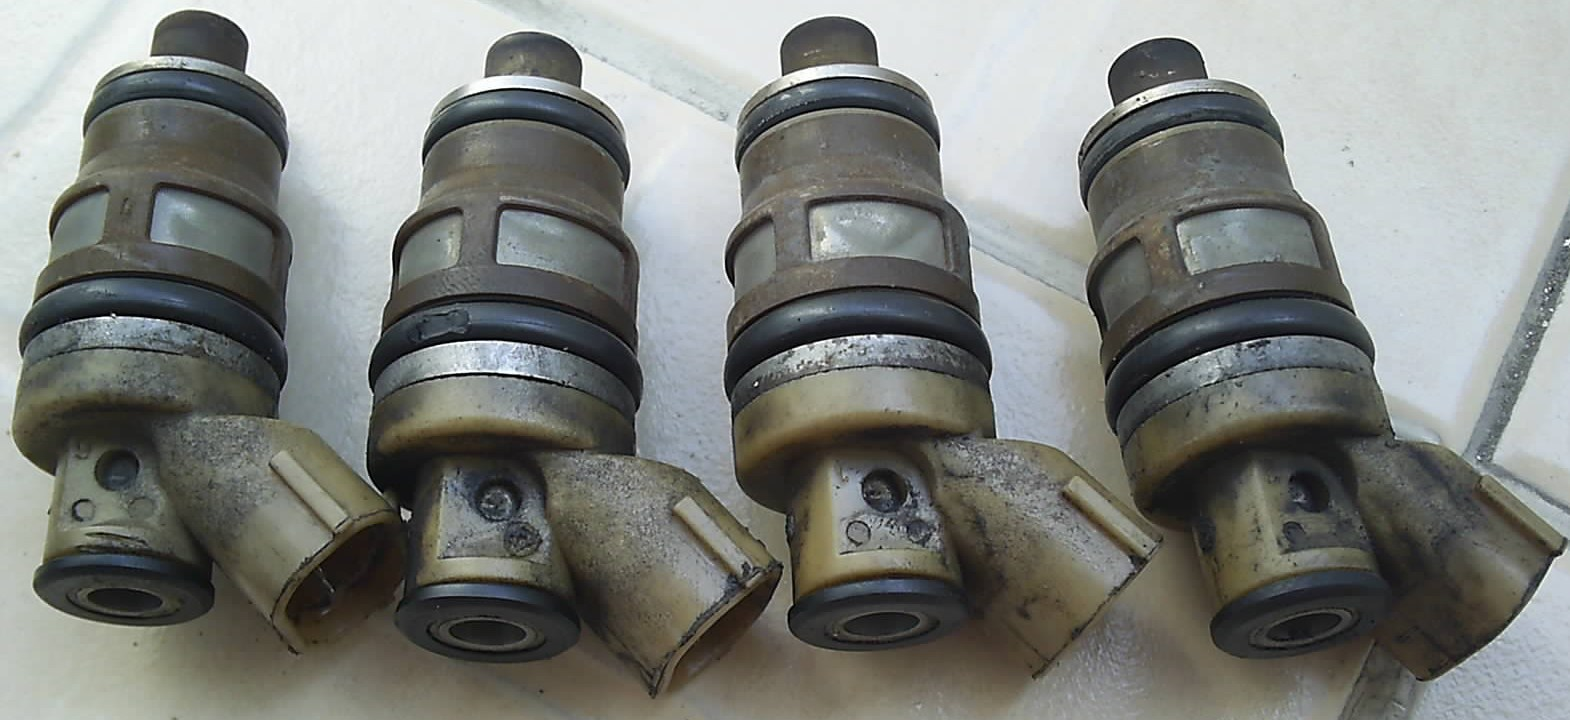 4AGE 20v injectors (secondhand), M11rf